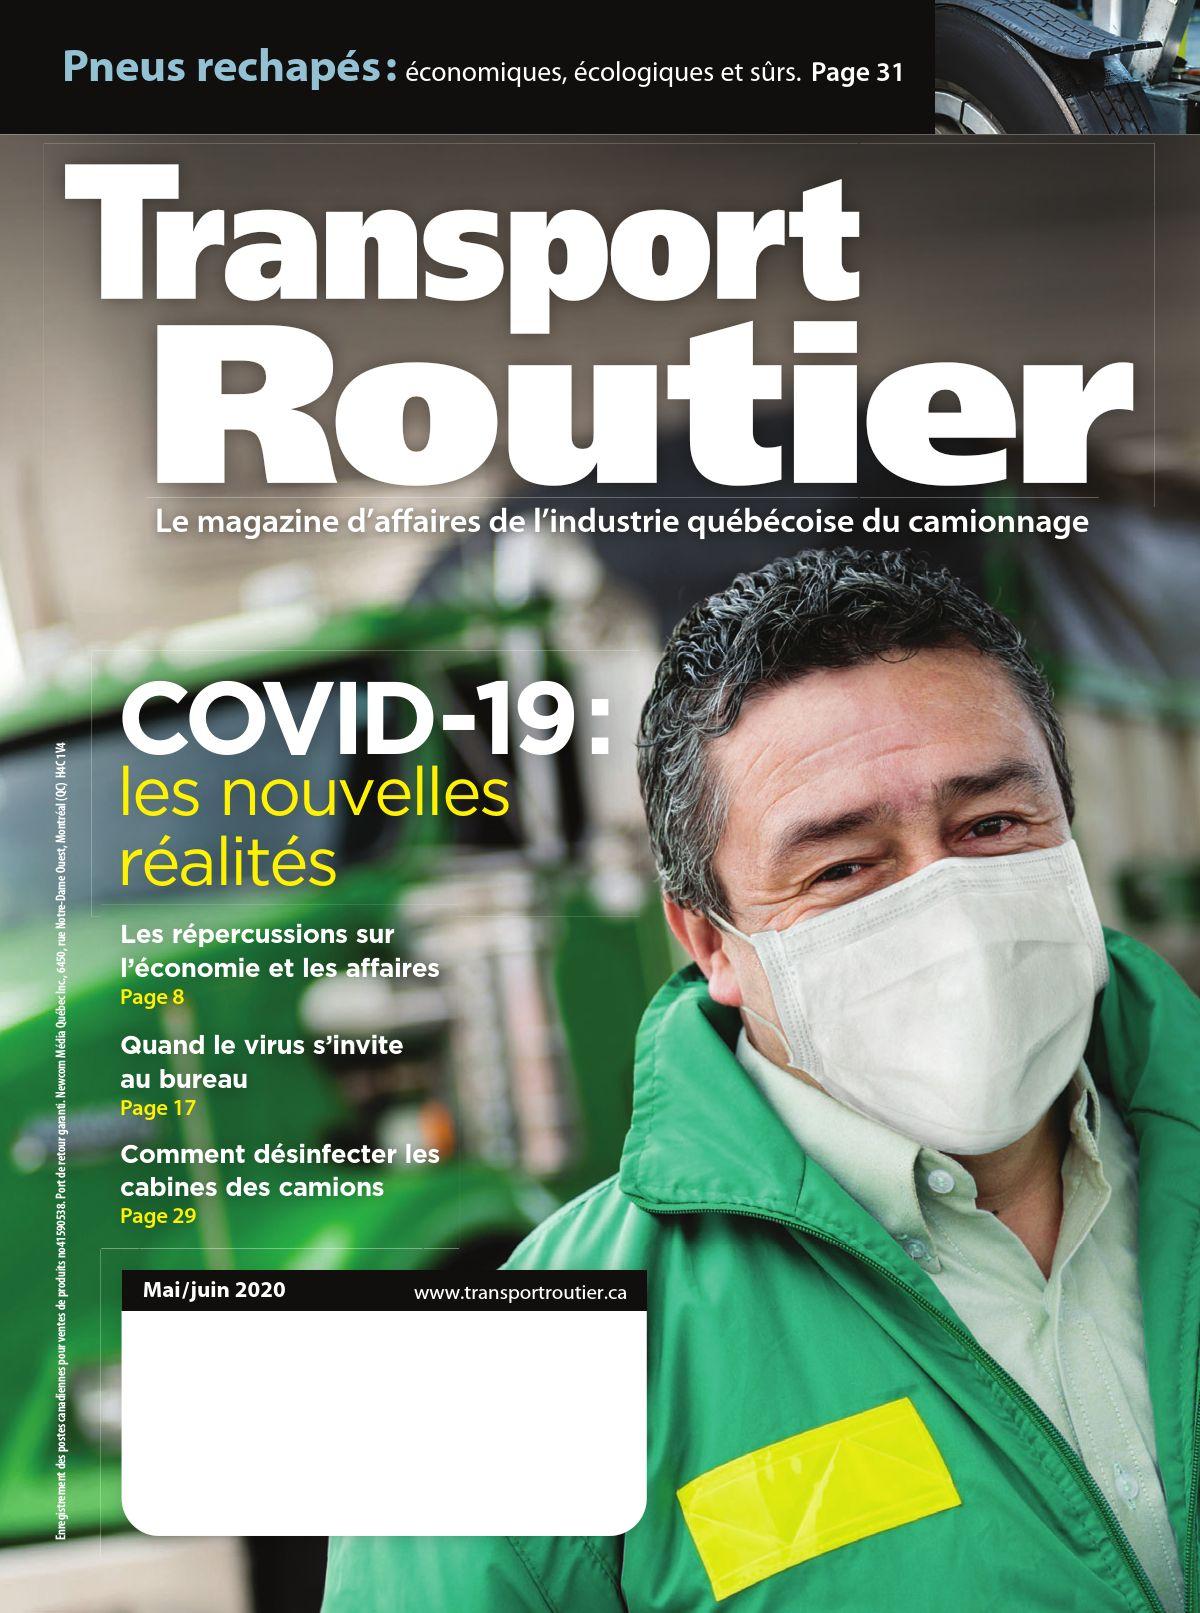 Transport routier – 1 mai 2020